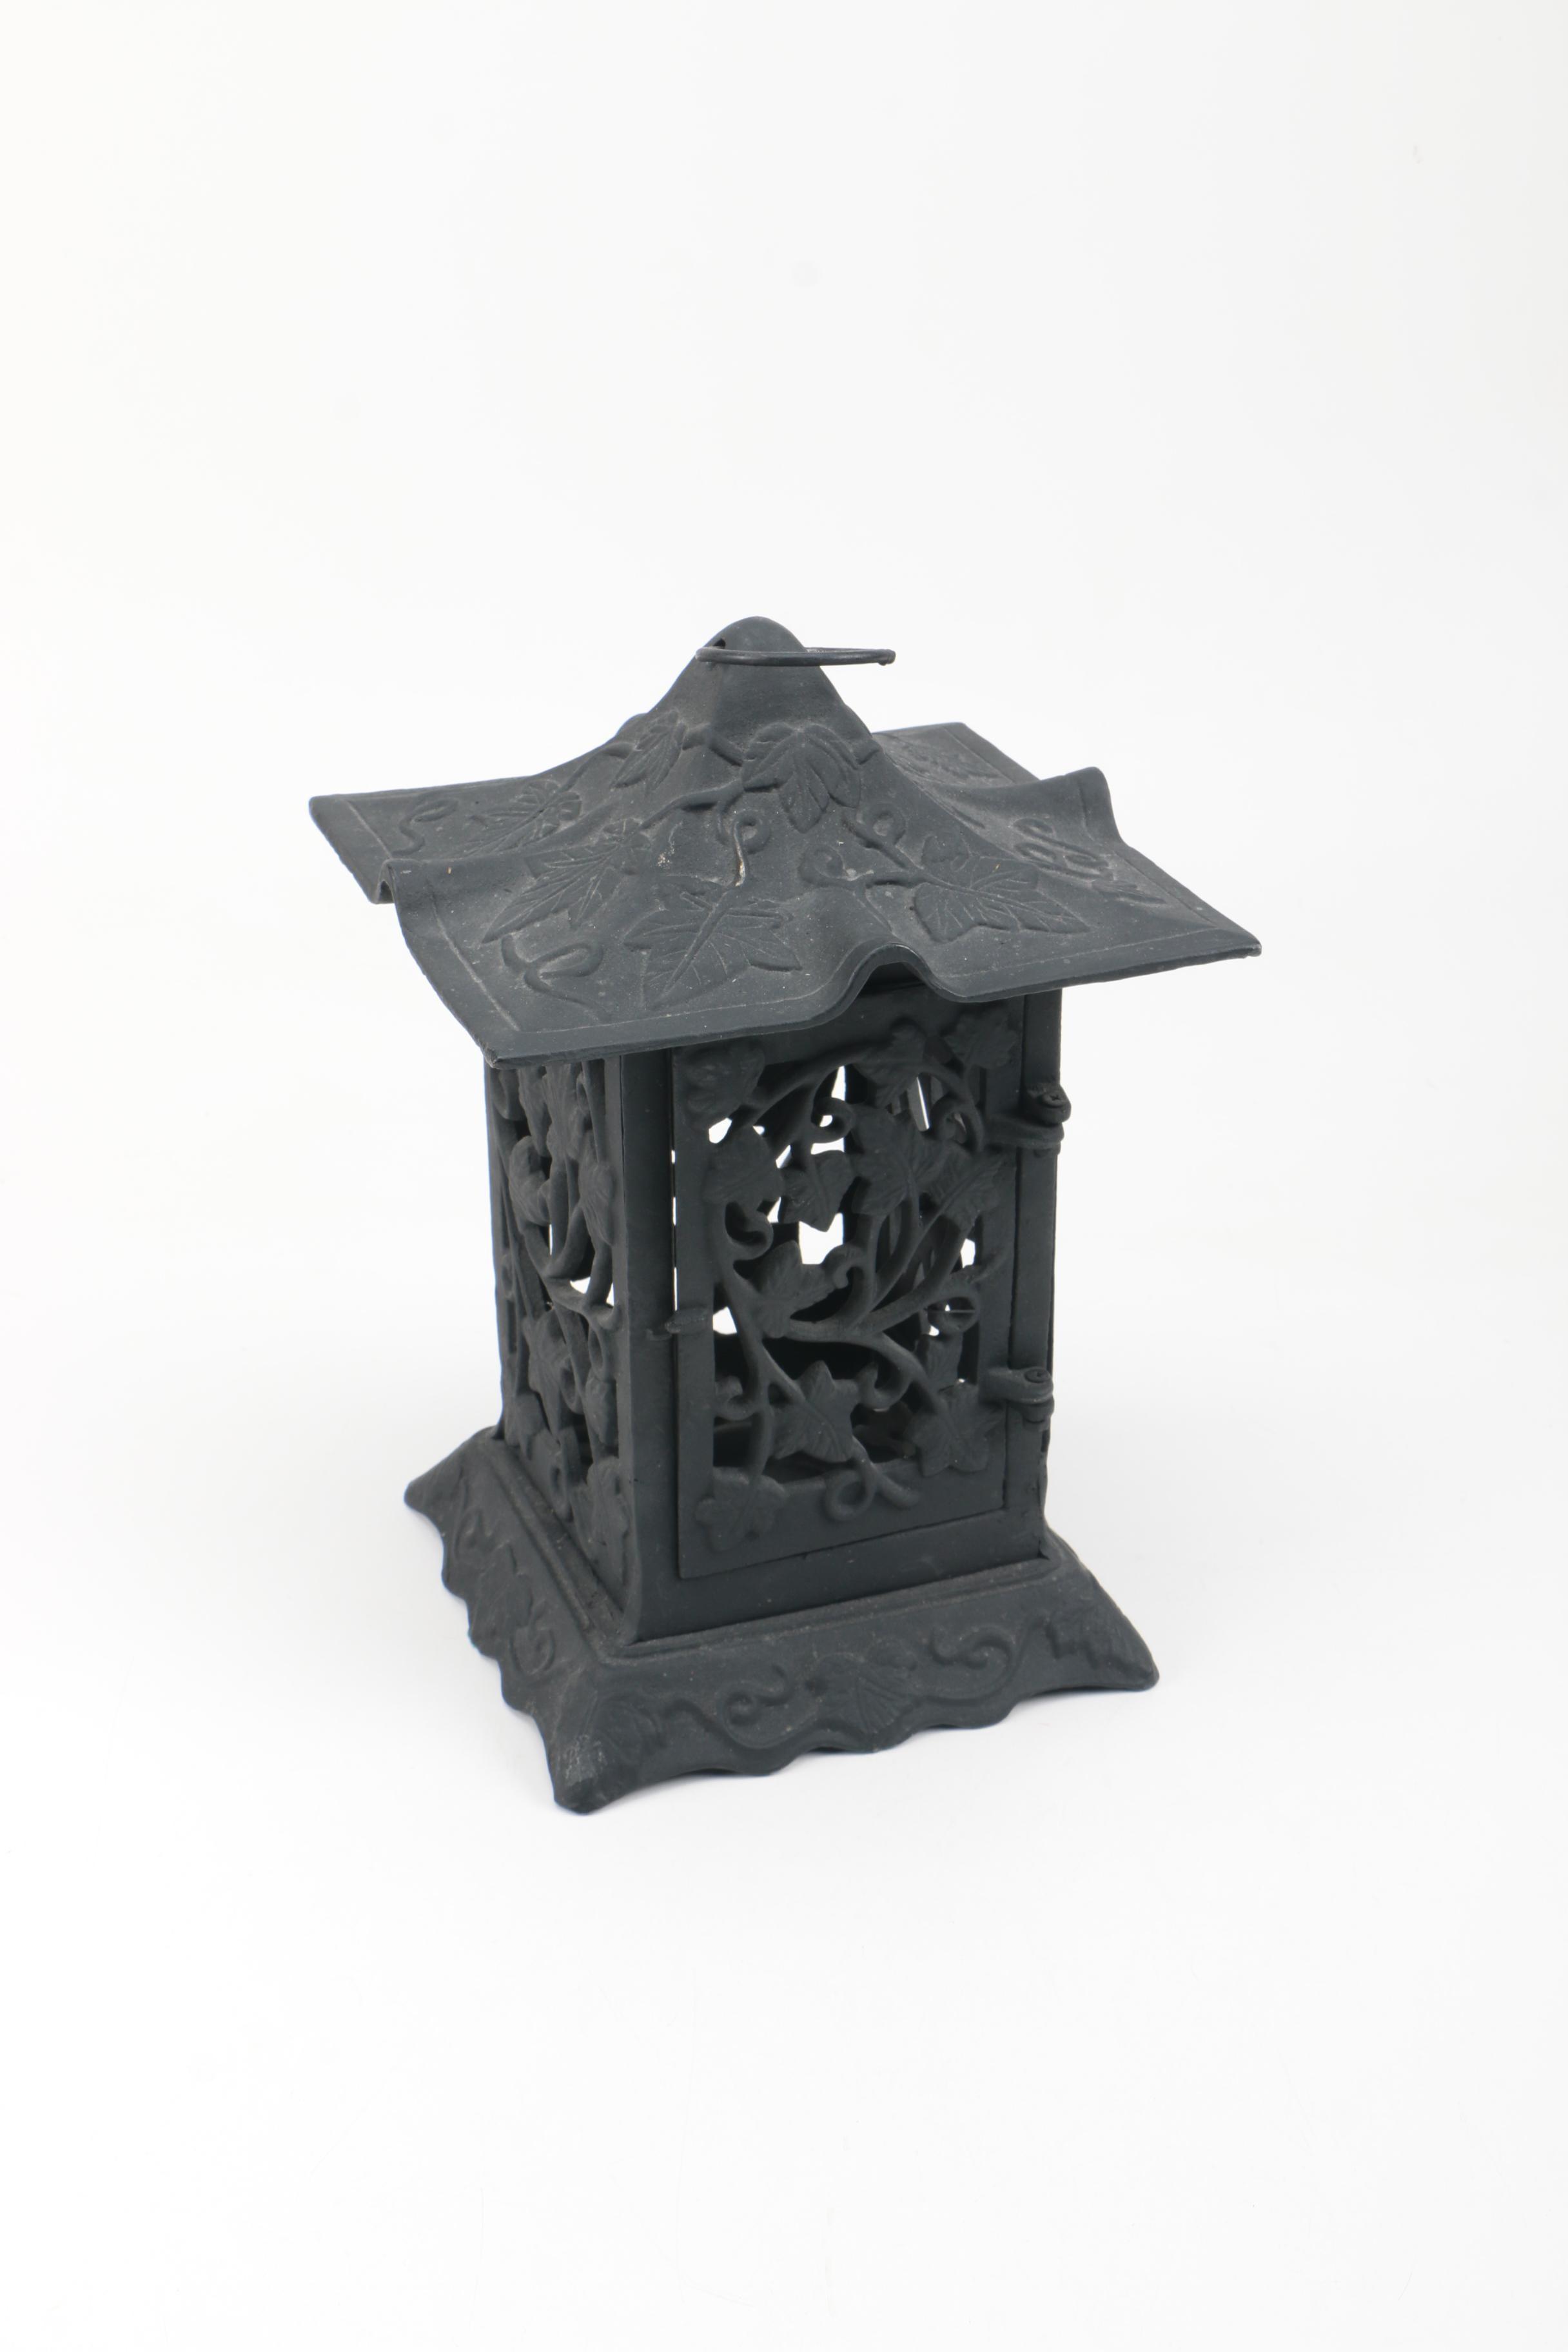 Cast Iron Pagoda Style Lantern